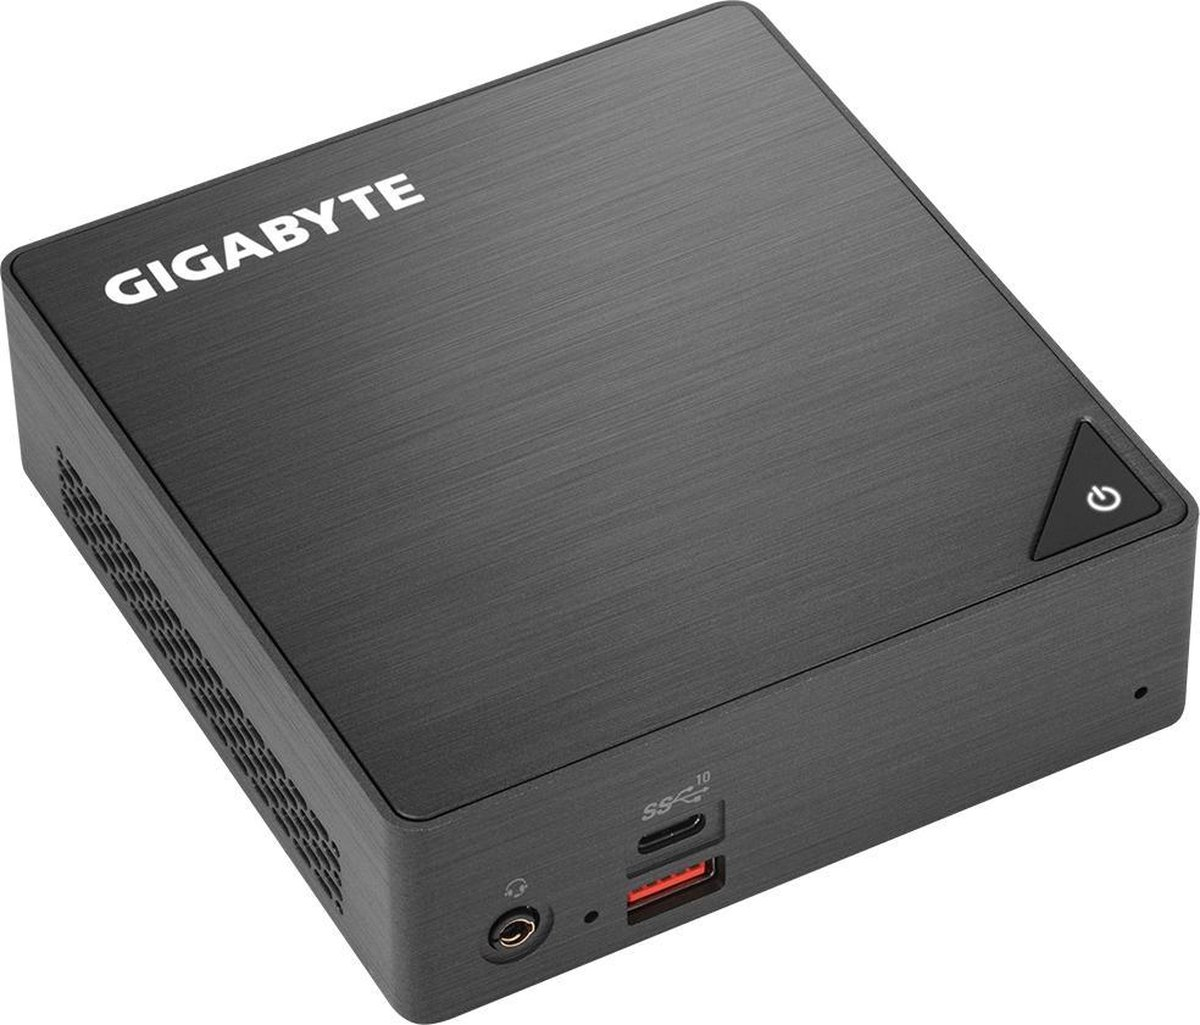 Gigabyte GB-BRI3-8130 PC/workstation barebone 0,46L maat pc Zwart i3-8130U 2,2 GHz